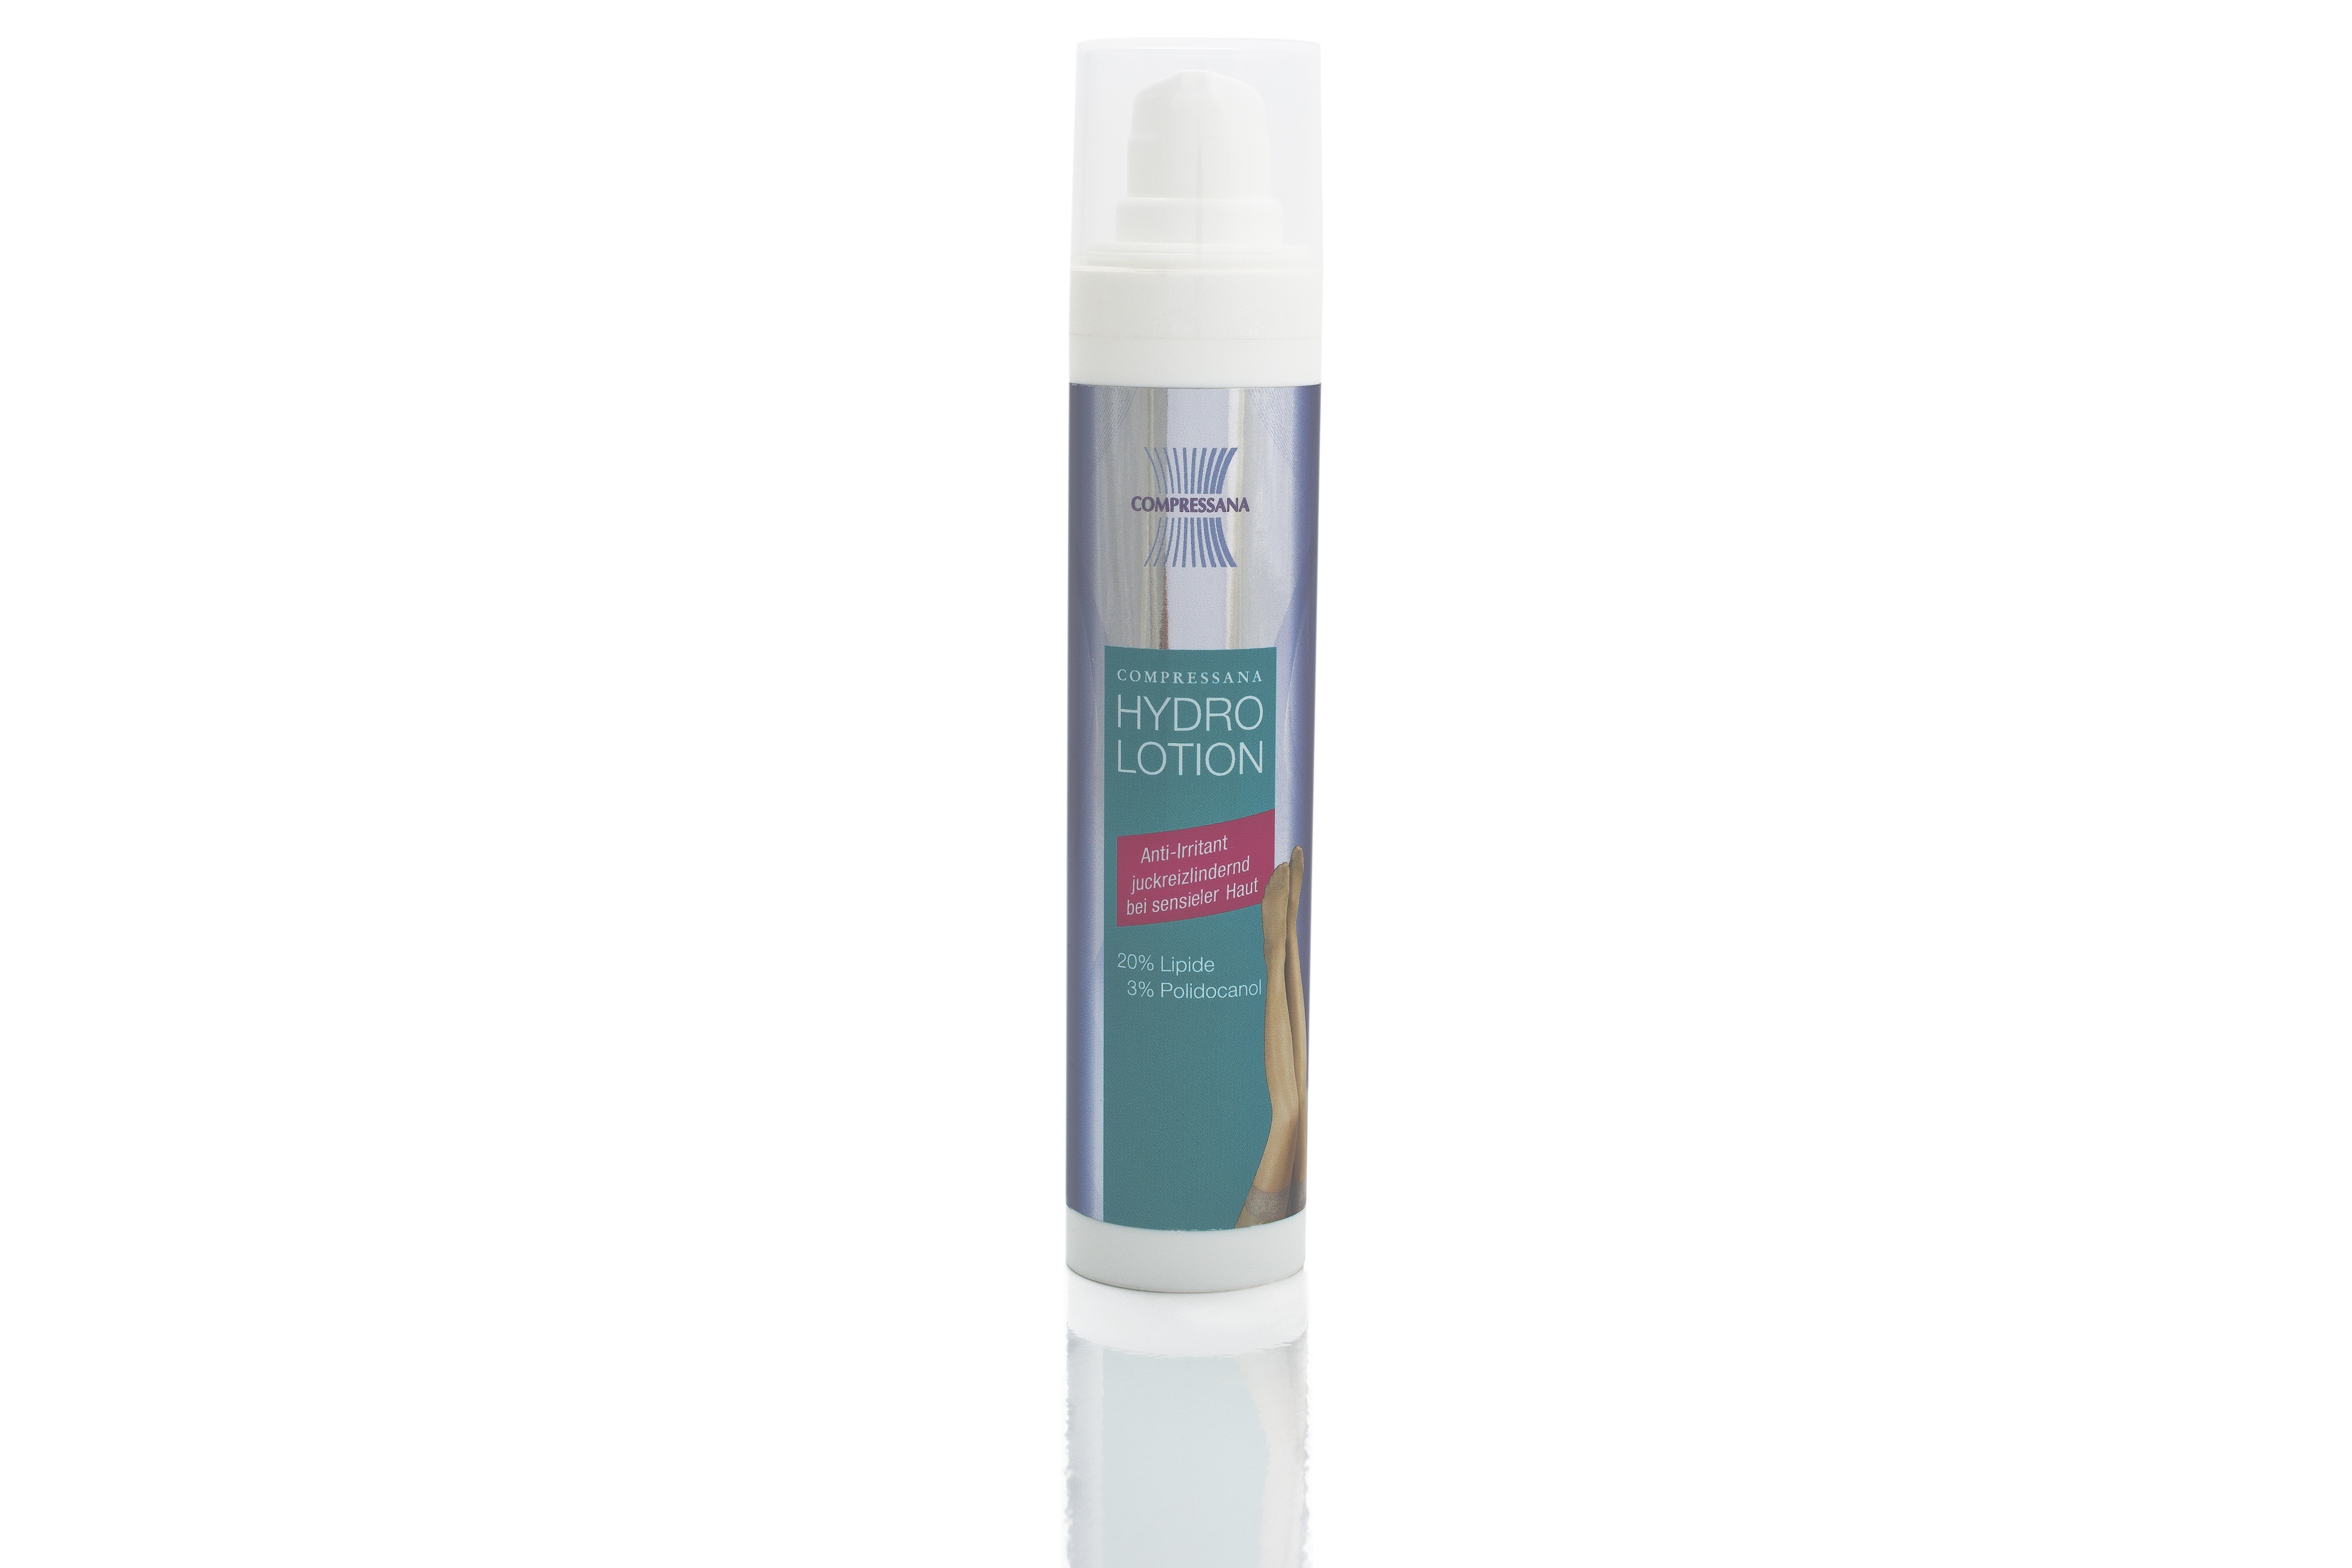 Compressana - Hydro Lotion - 50 ml - Pumpspender